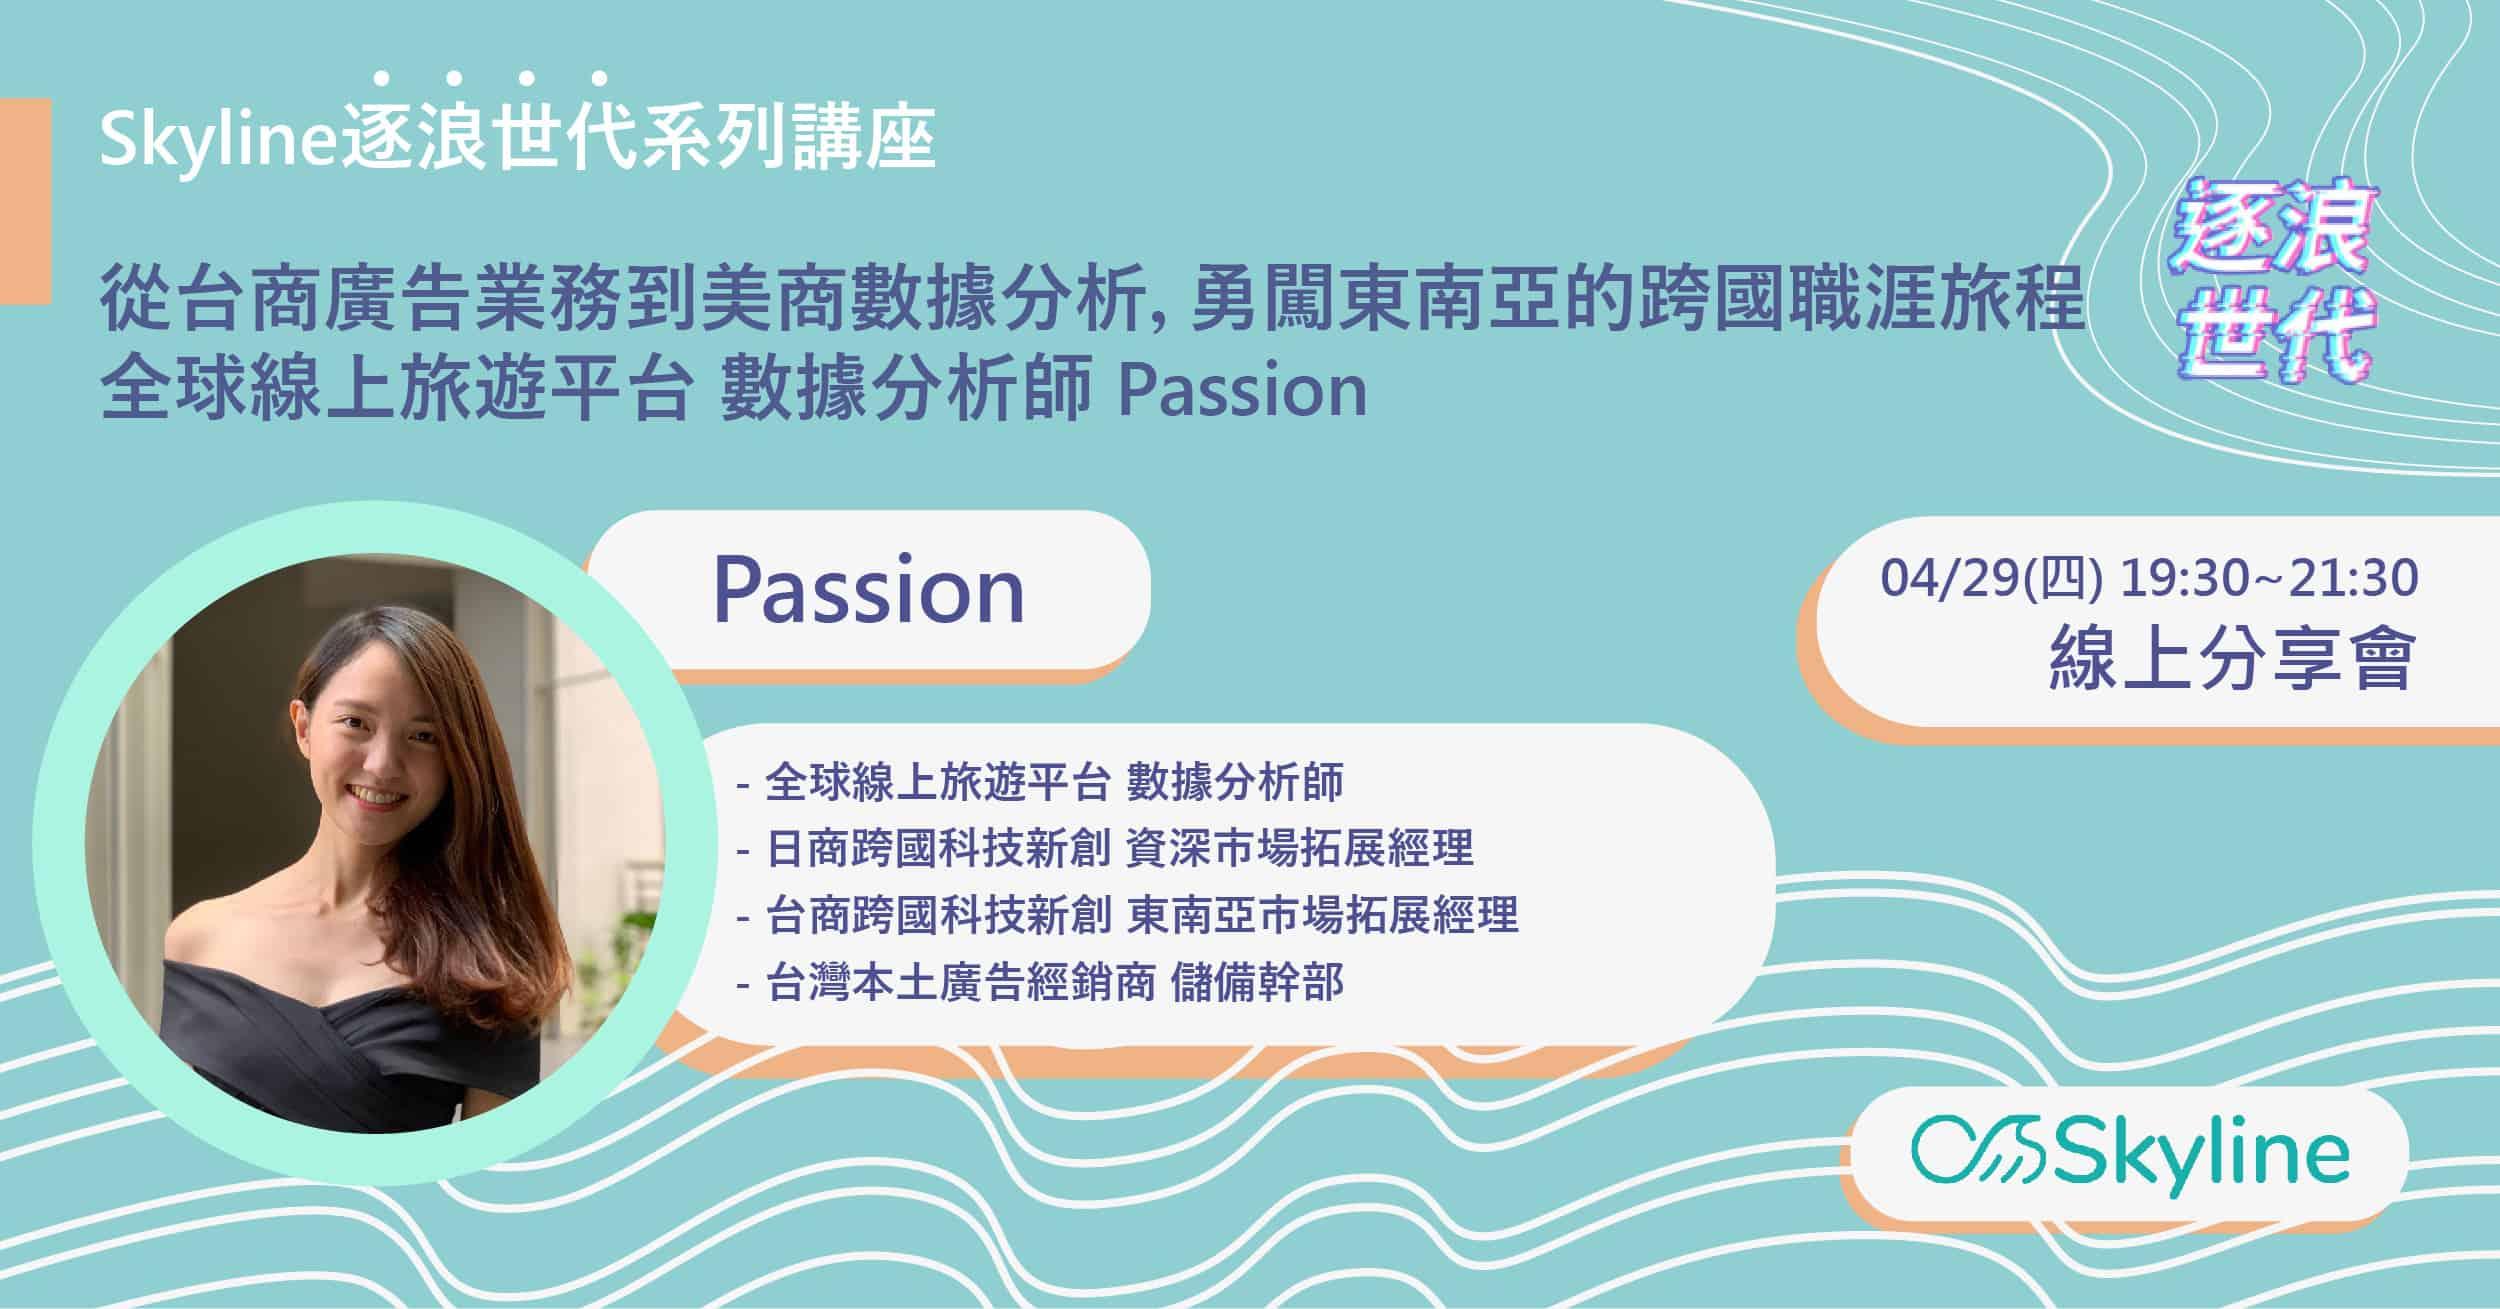 【Skyline逐浪世代:全球線上旅遊平台的數據分析師Passion】職涯路上探索自我,勇闖東南亞的數據分析師